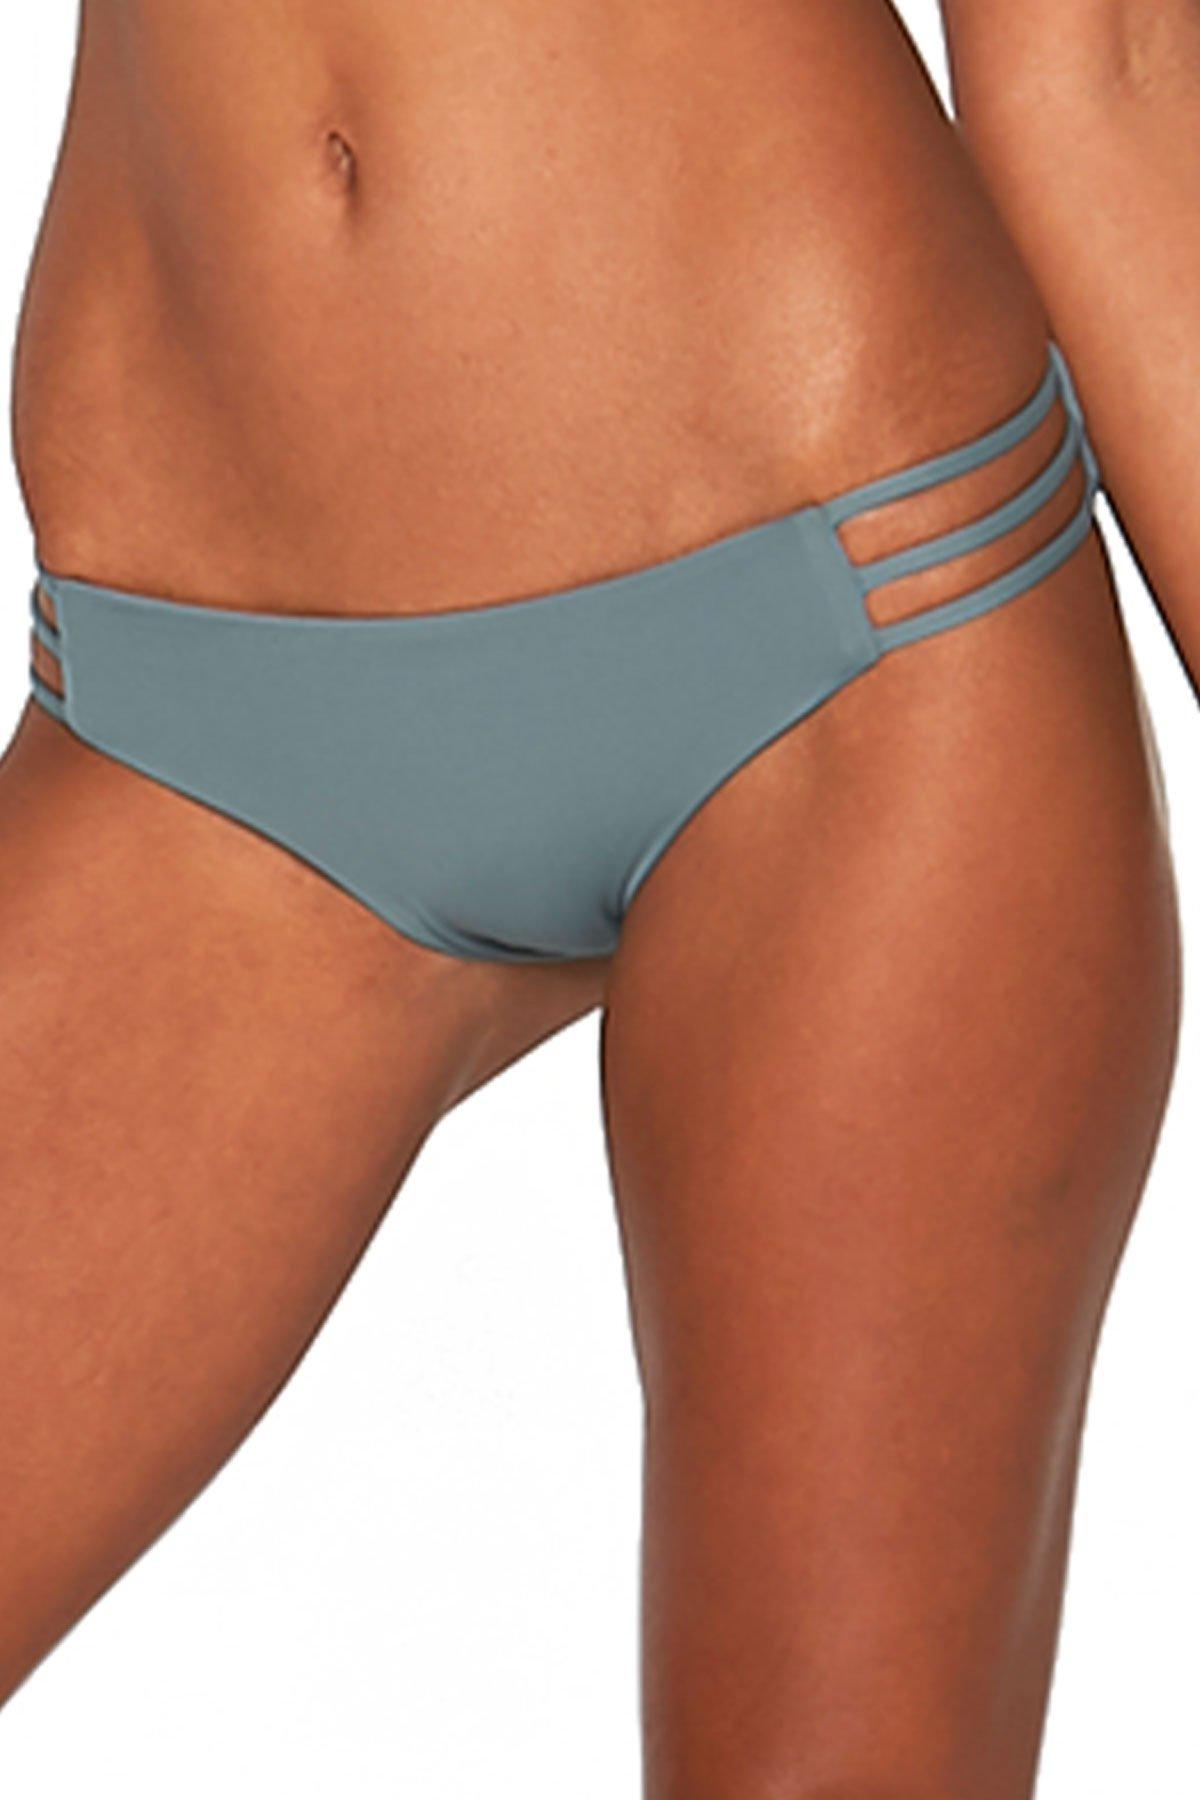 LSpace Women's LSolids Tab Side Hipster Bikini Bottom Slated Glass M